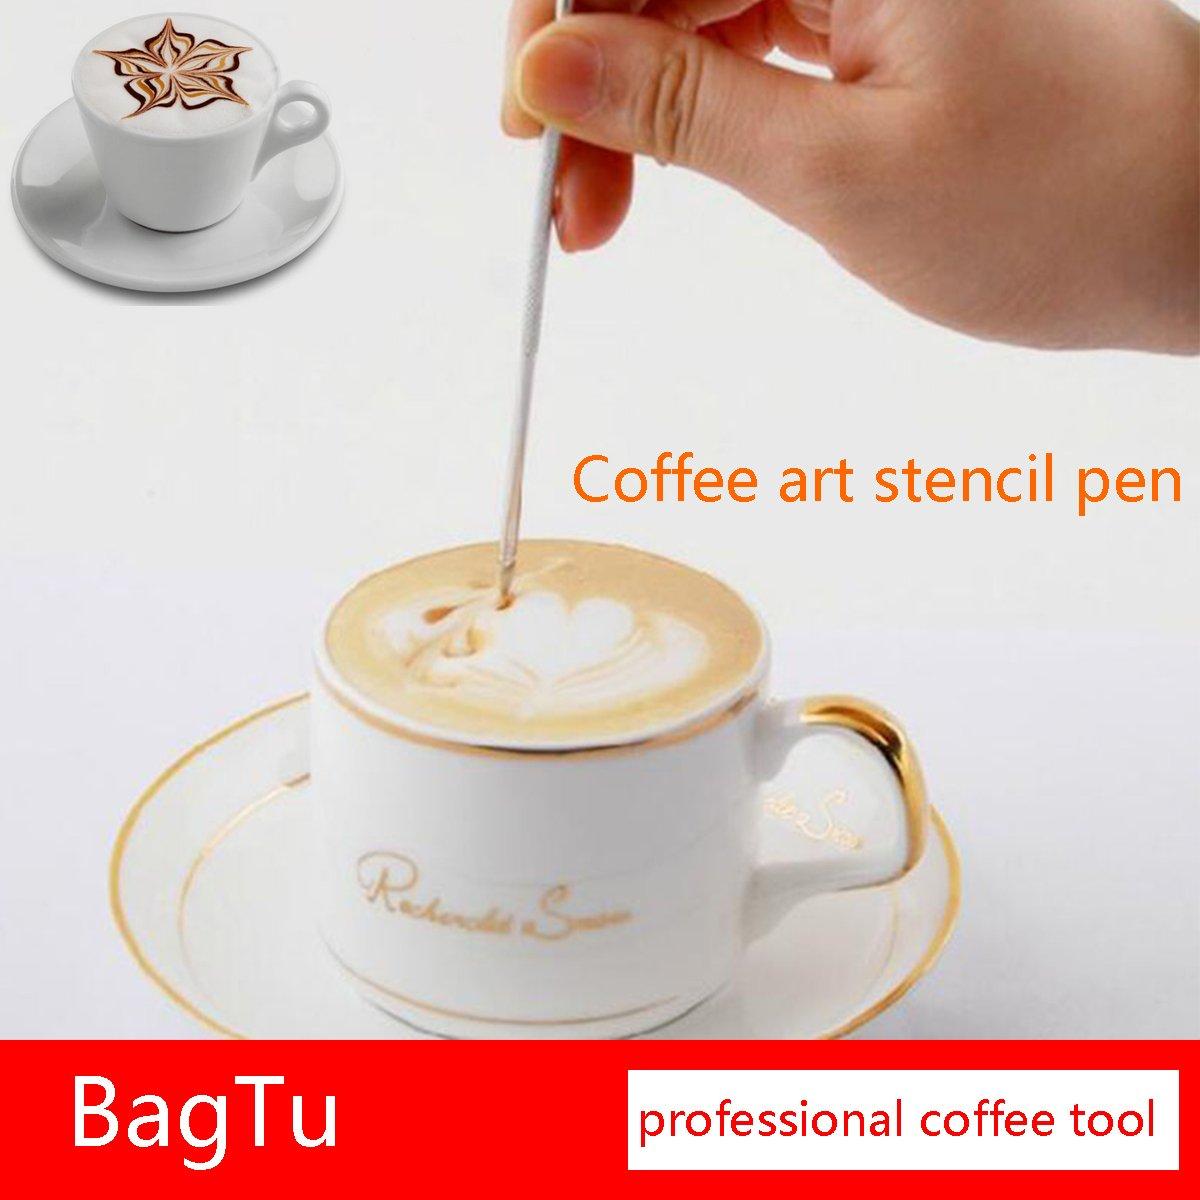 BagTu Café Cepillo de limpieza herramienta Set para café expreso máquina Group Head, negro, pack de 3: Amazon.es: Hogar